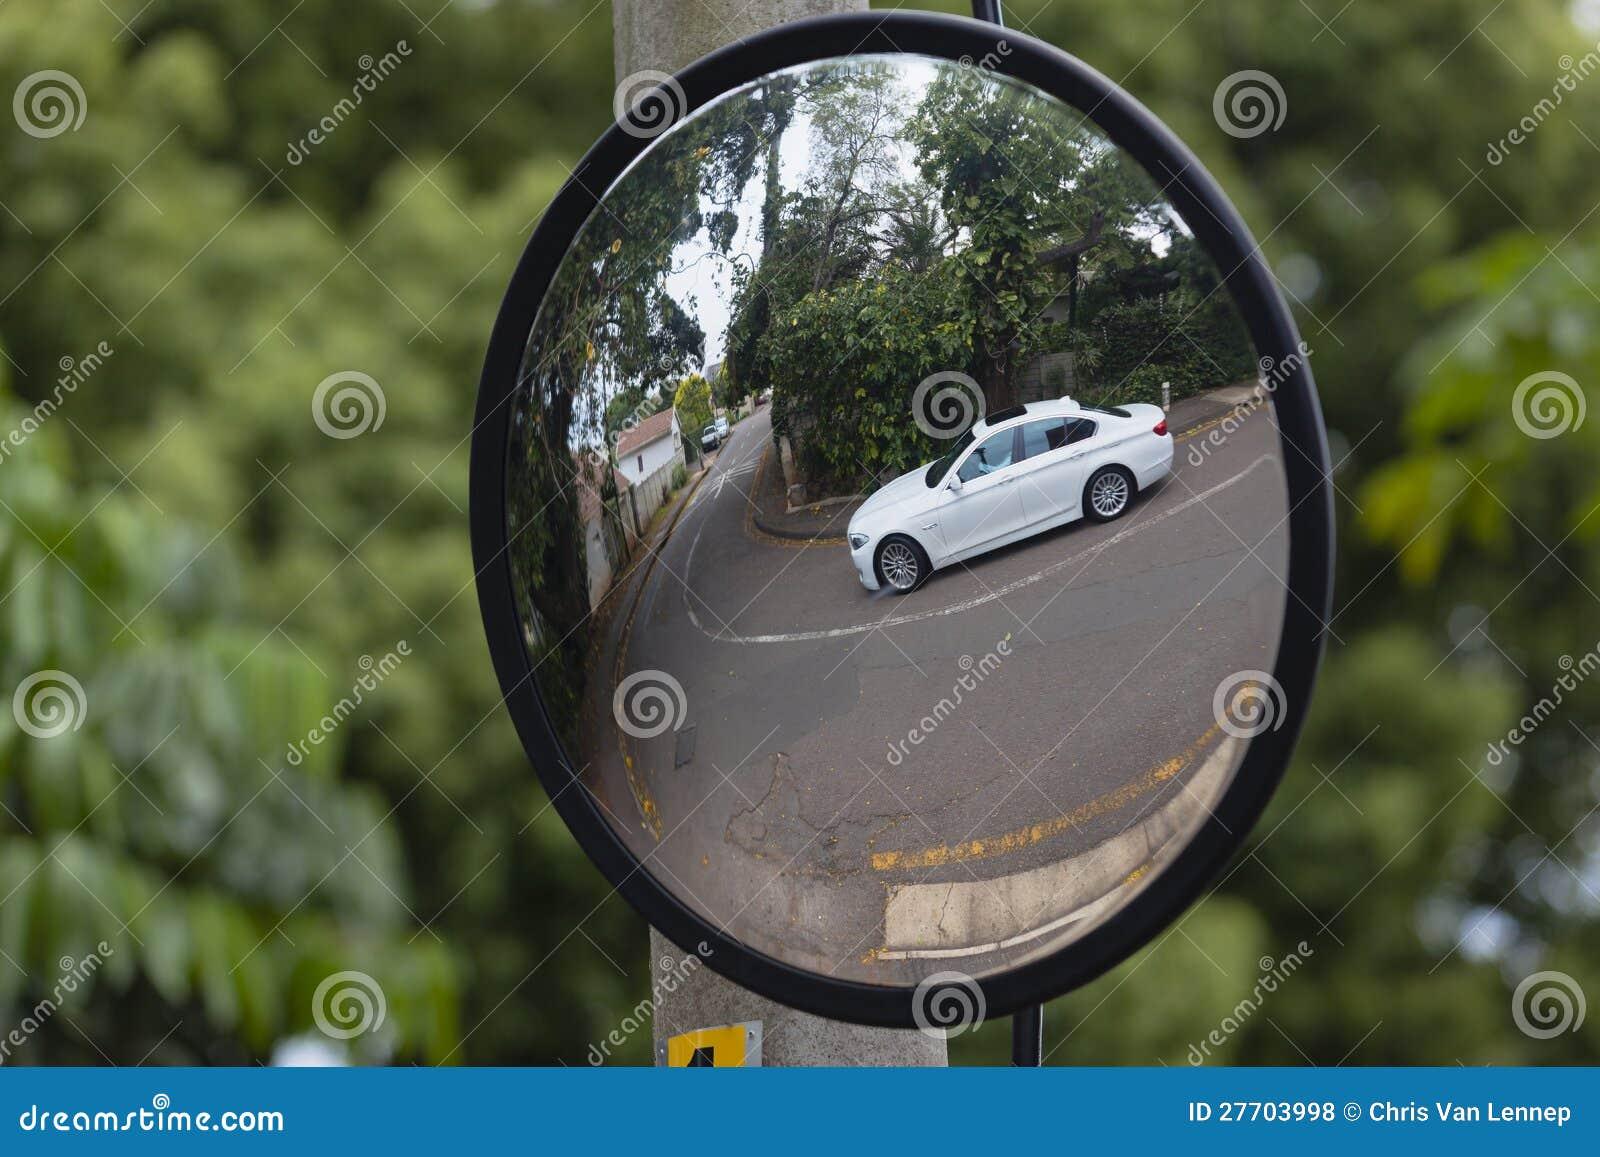 Mirror Road Blind Corner Vehicle Editorial Stock Photo